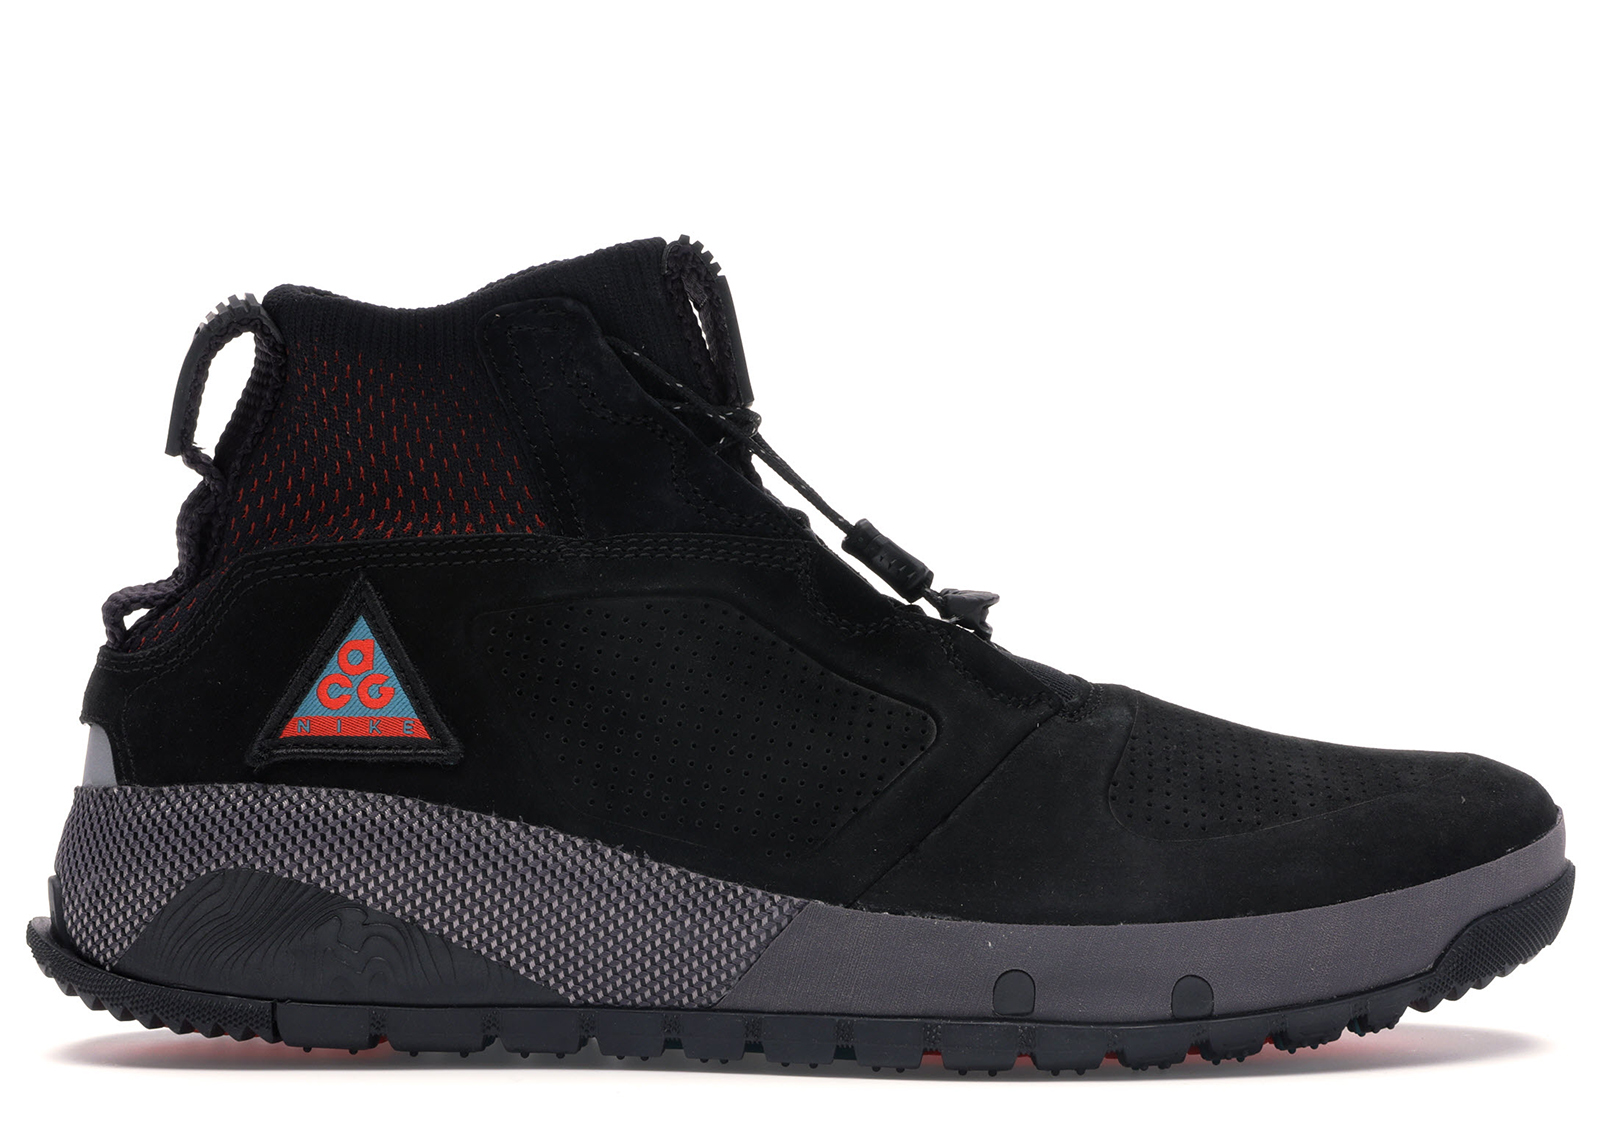 Nike NIKE ACG RUCKEL RIDGE shoes black